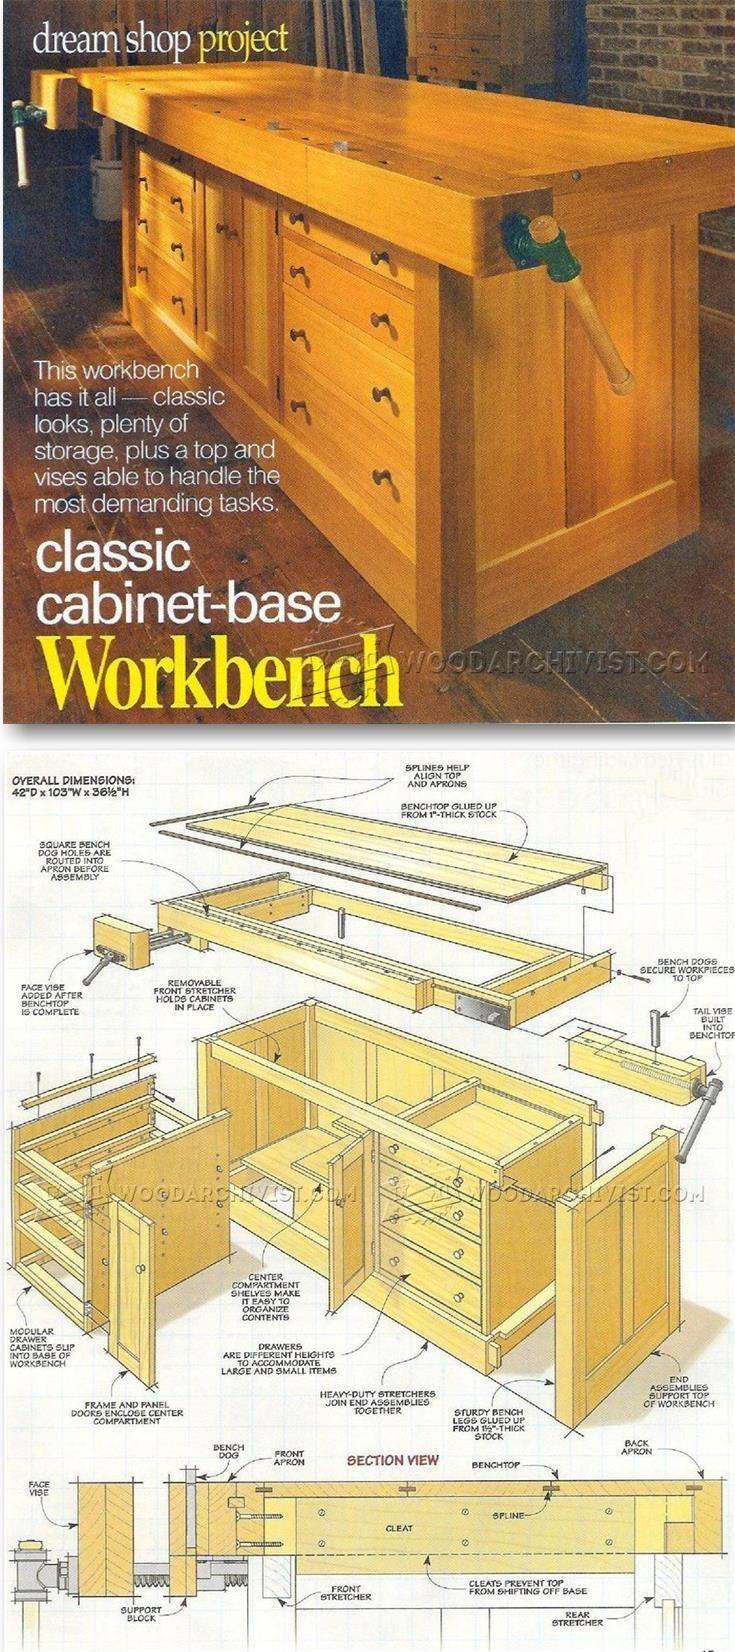 Classic Workbench Plans - Workshop Solutions Plans, Tips and Tricks | WoodArchivist.com